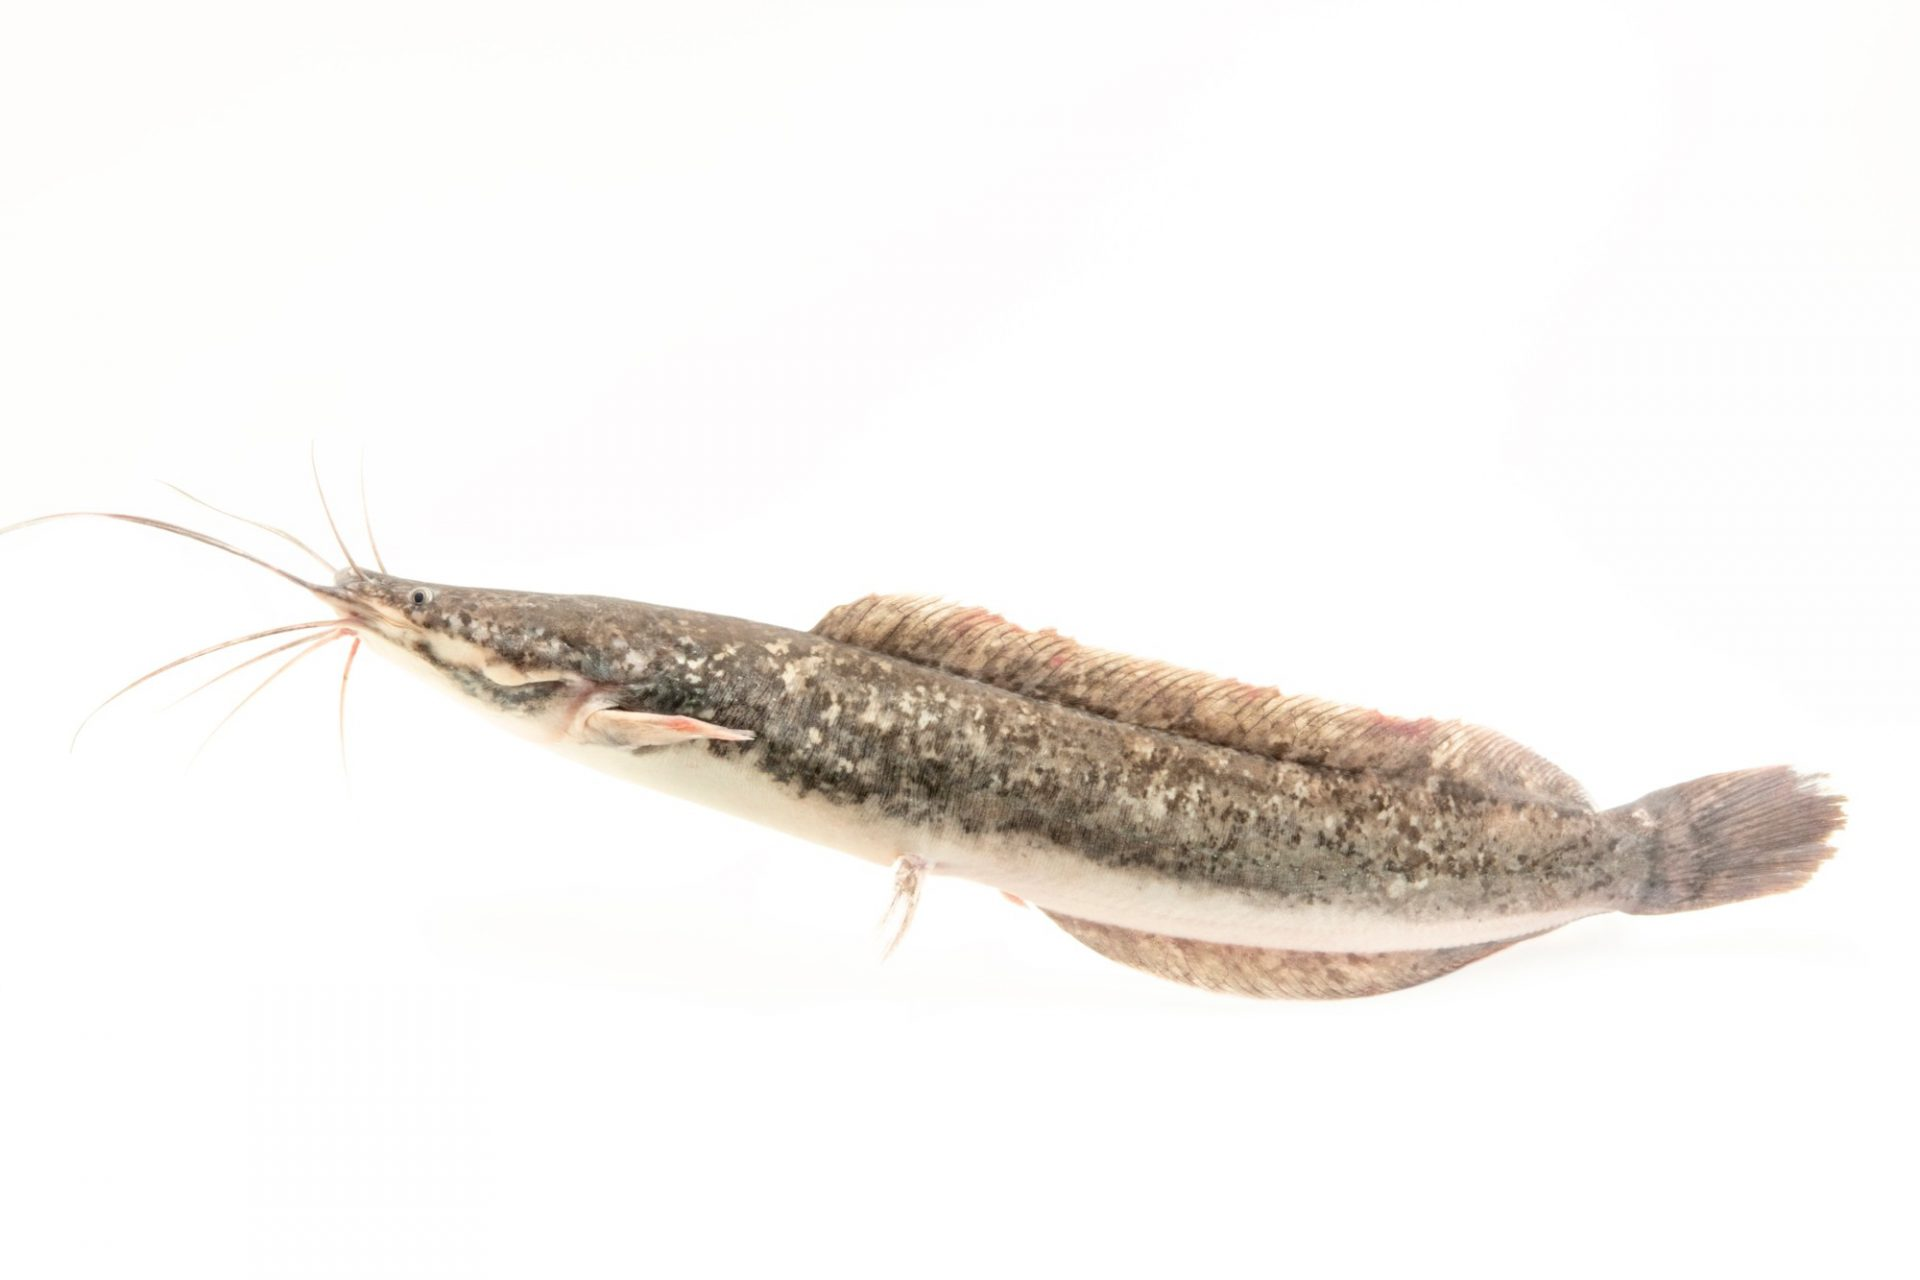 Photo: An African sharptooth catfish (Clarias gariepinus) at Davao Crocodile Park.